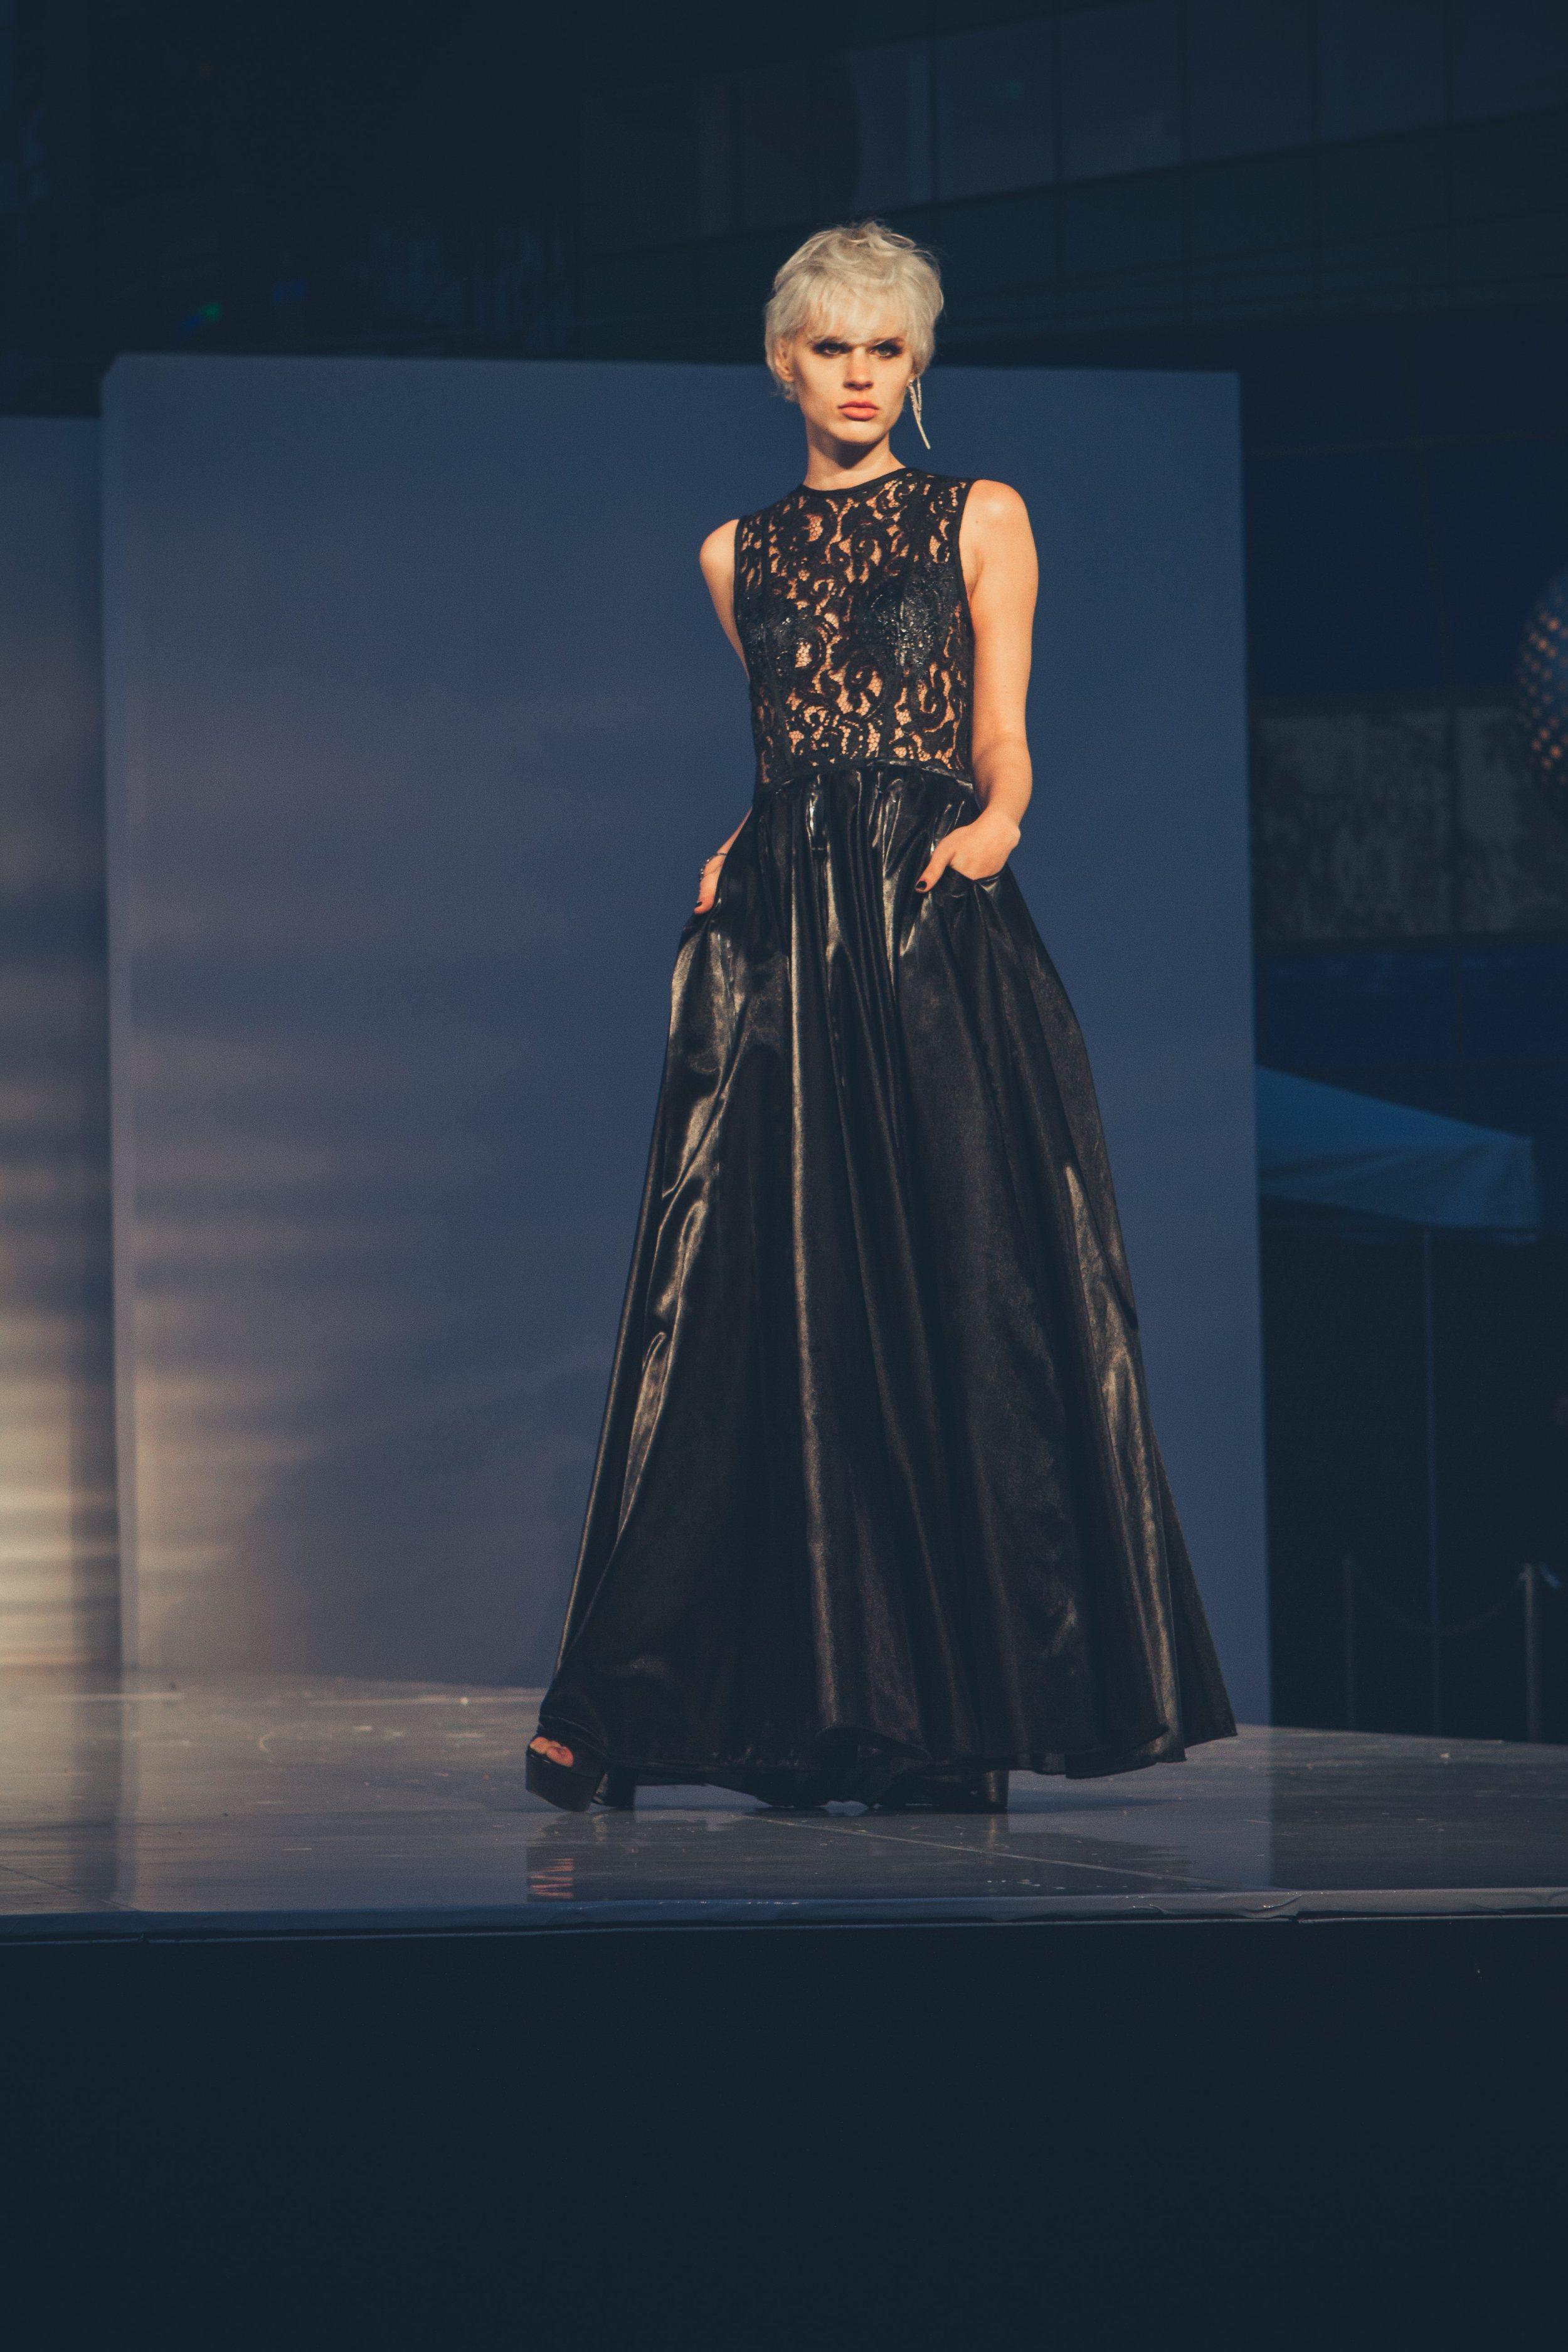 Coral Castillo Designs - Shaina Lavine - Style Fashion Week Los Angeles - Kyle Rea Photography - cREAtive Castle Studios.jpg